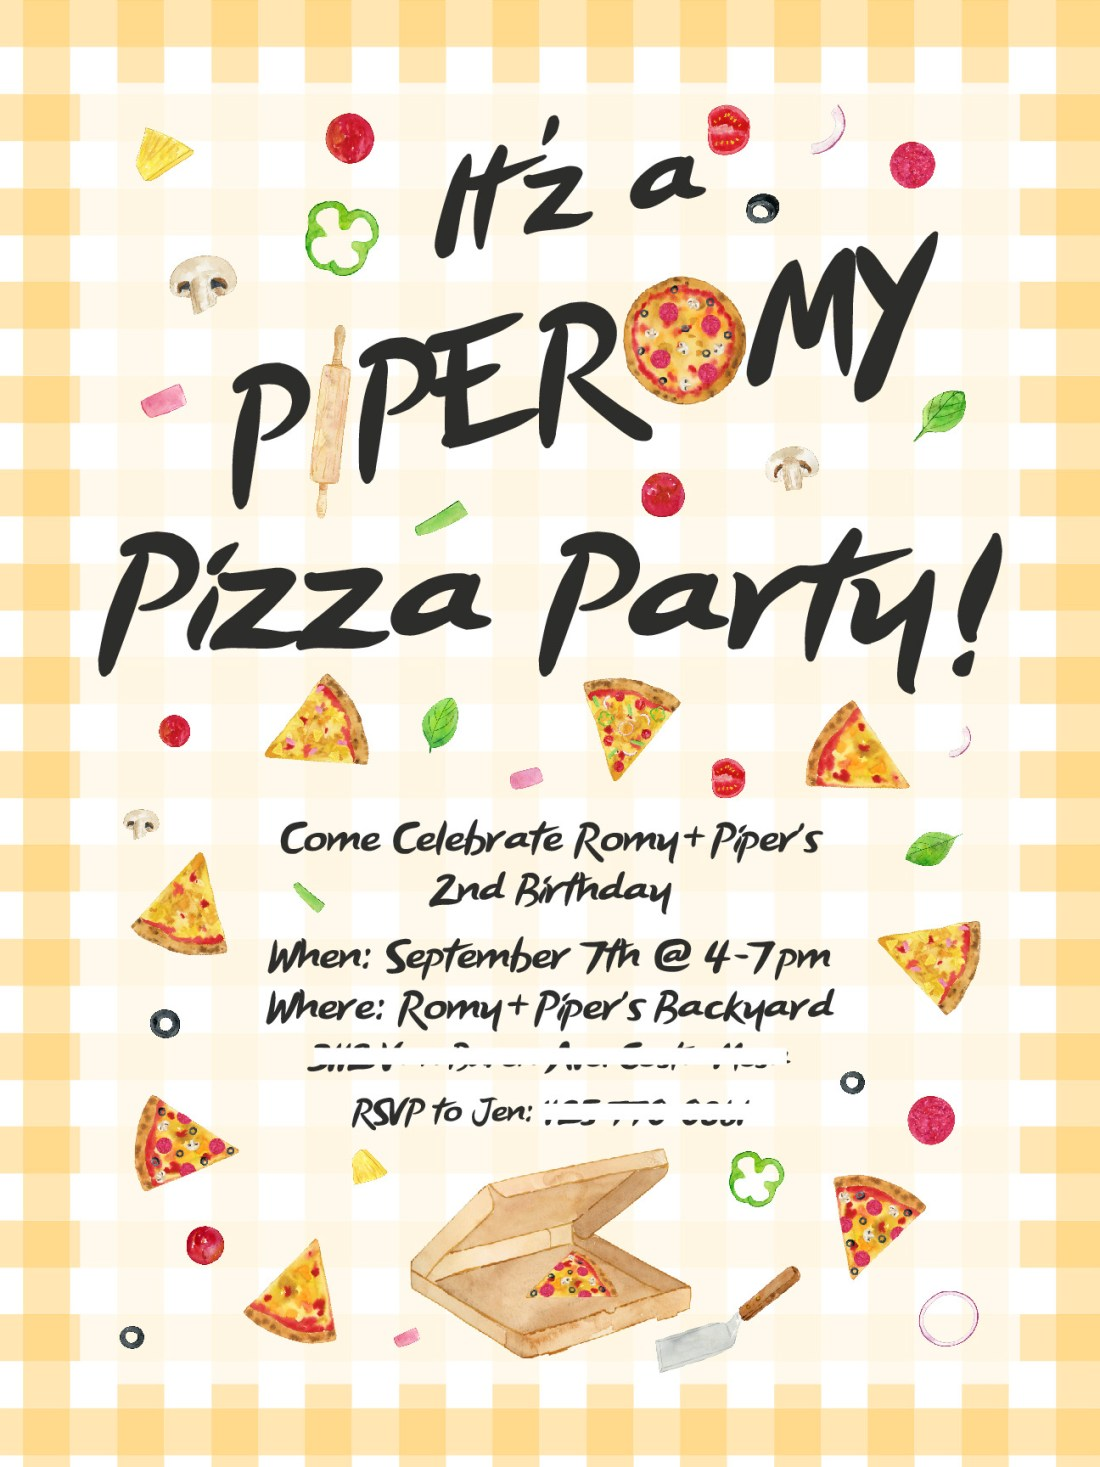 Romy + Piper 2nd Bday | Pizza Party Birthday Invitation